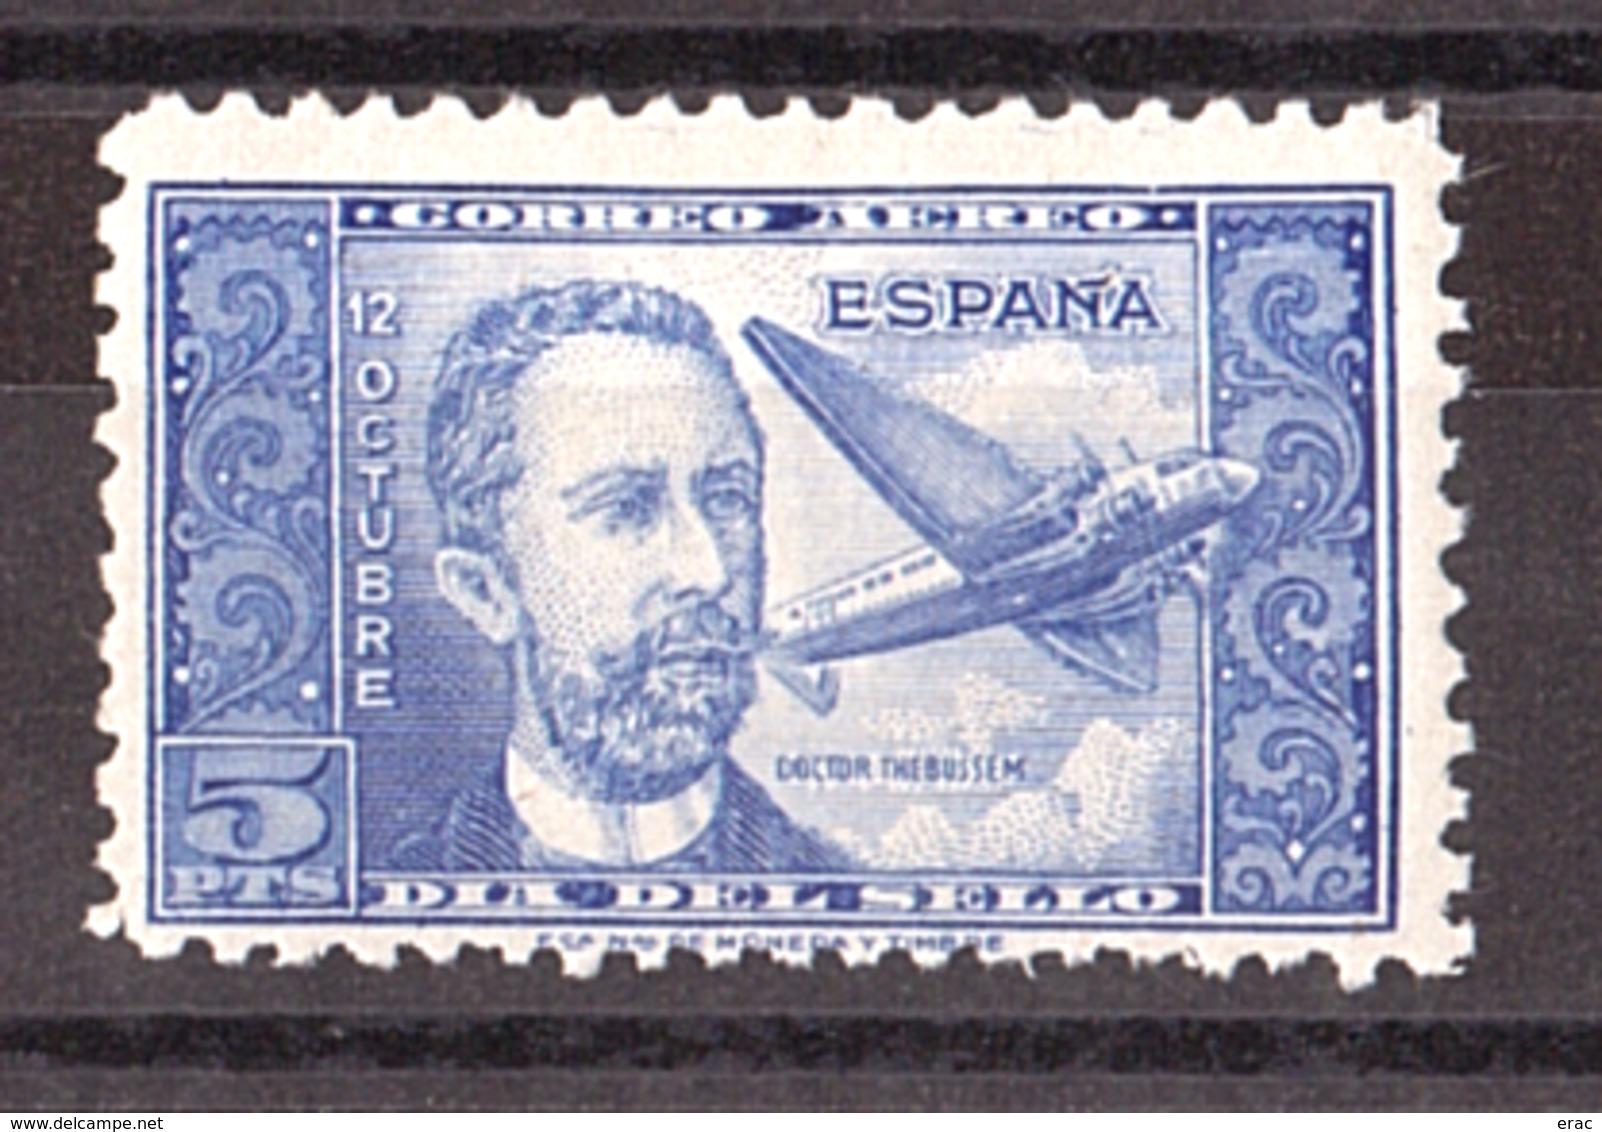 Espagne - 1944 - PA N° 227 - Neuf * - Doctor Thebussem - Poste Aérienne